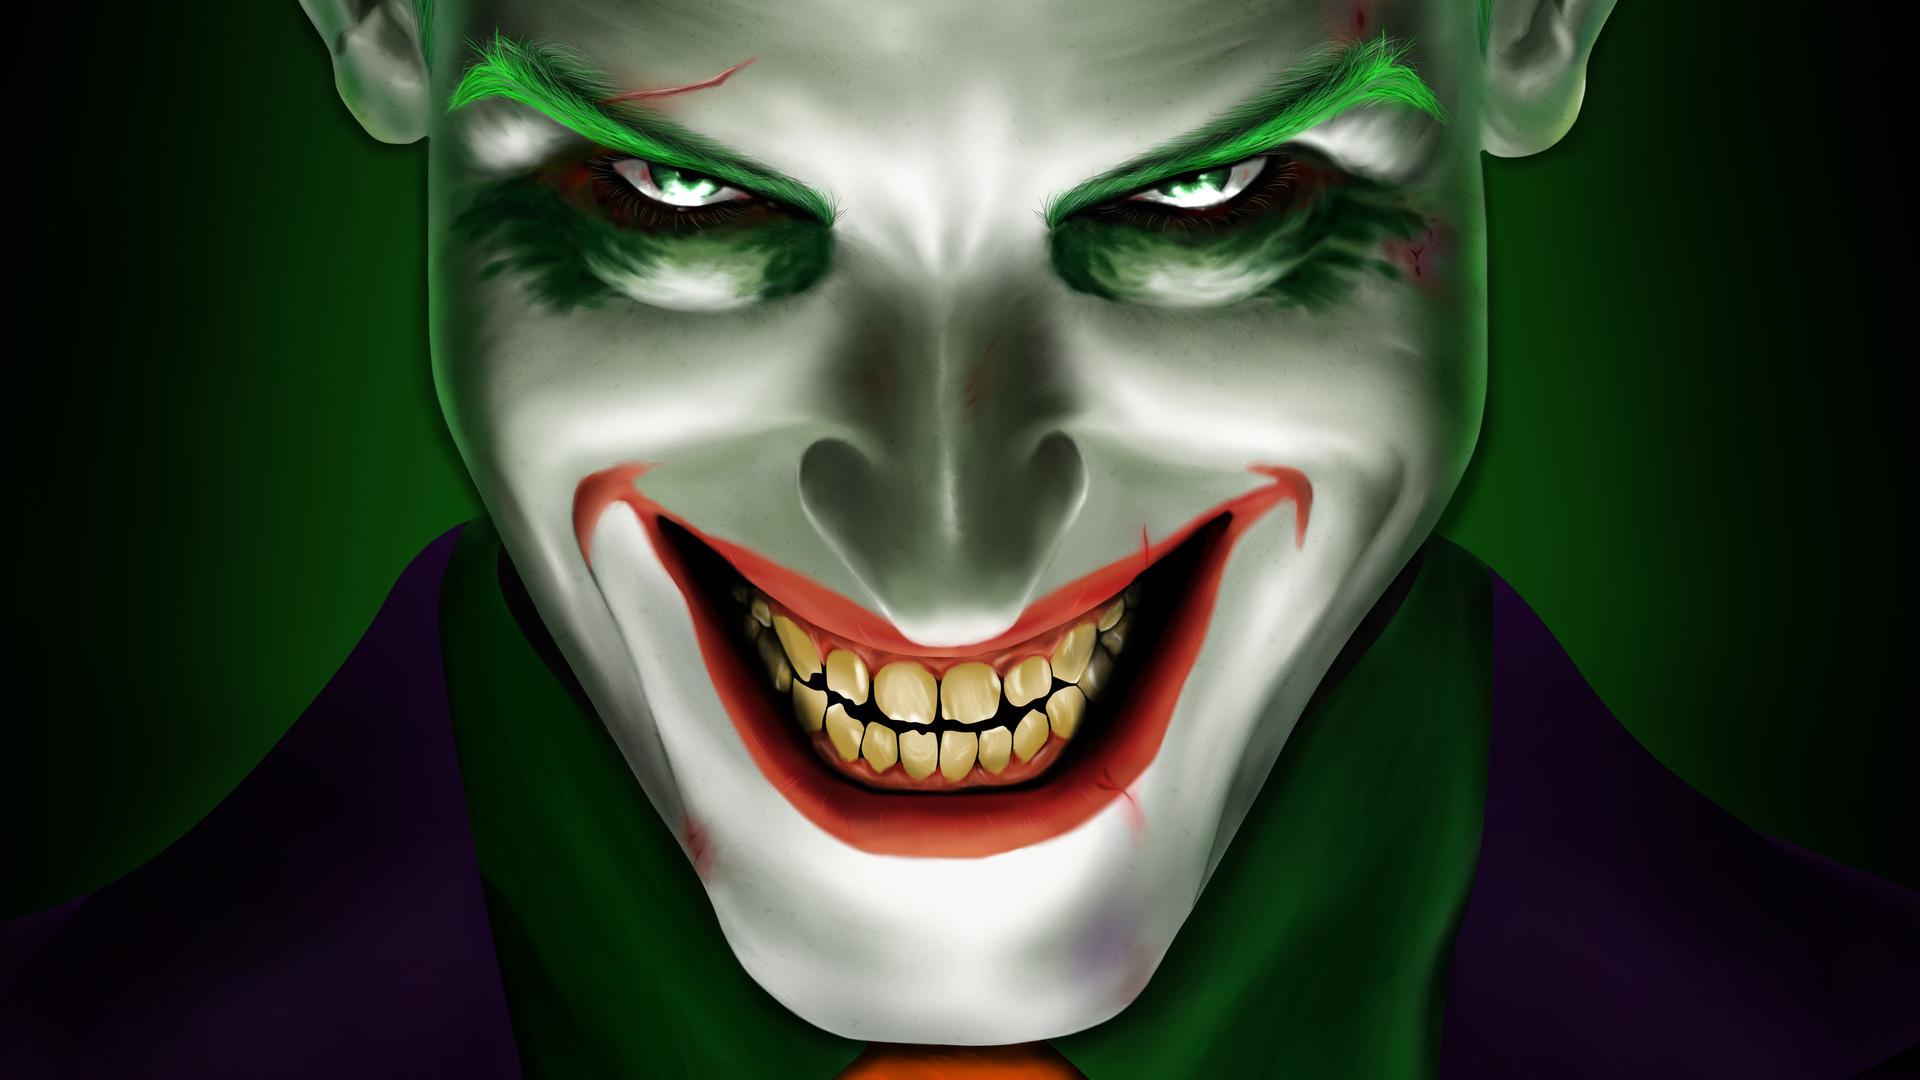 1920x1080 Joker Smiling 5k Laptop Full Hd 1080p Hd 4k